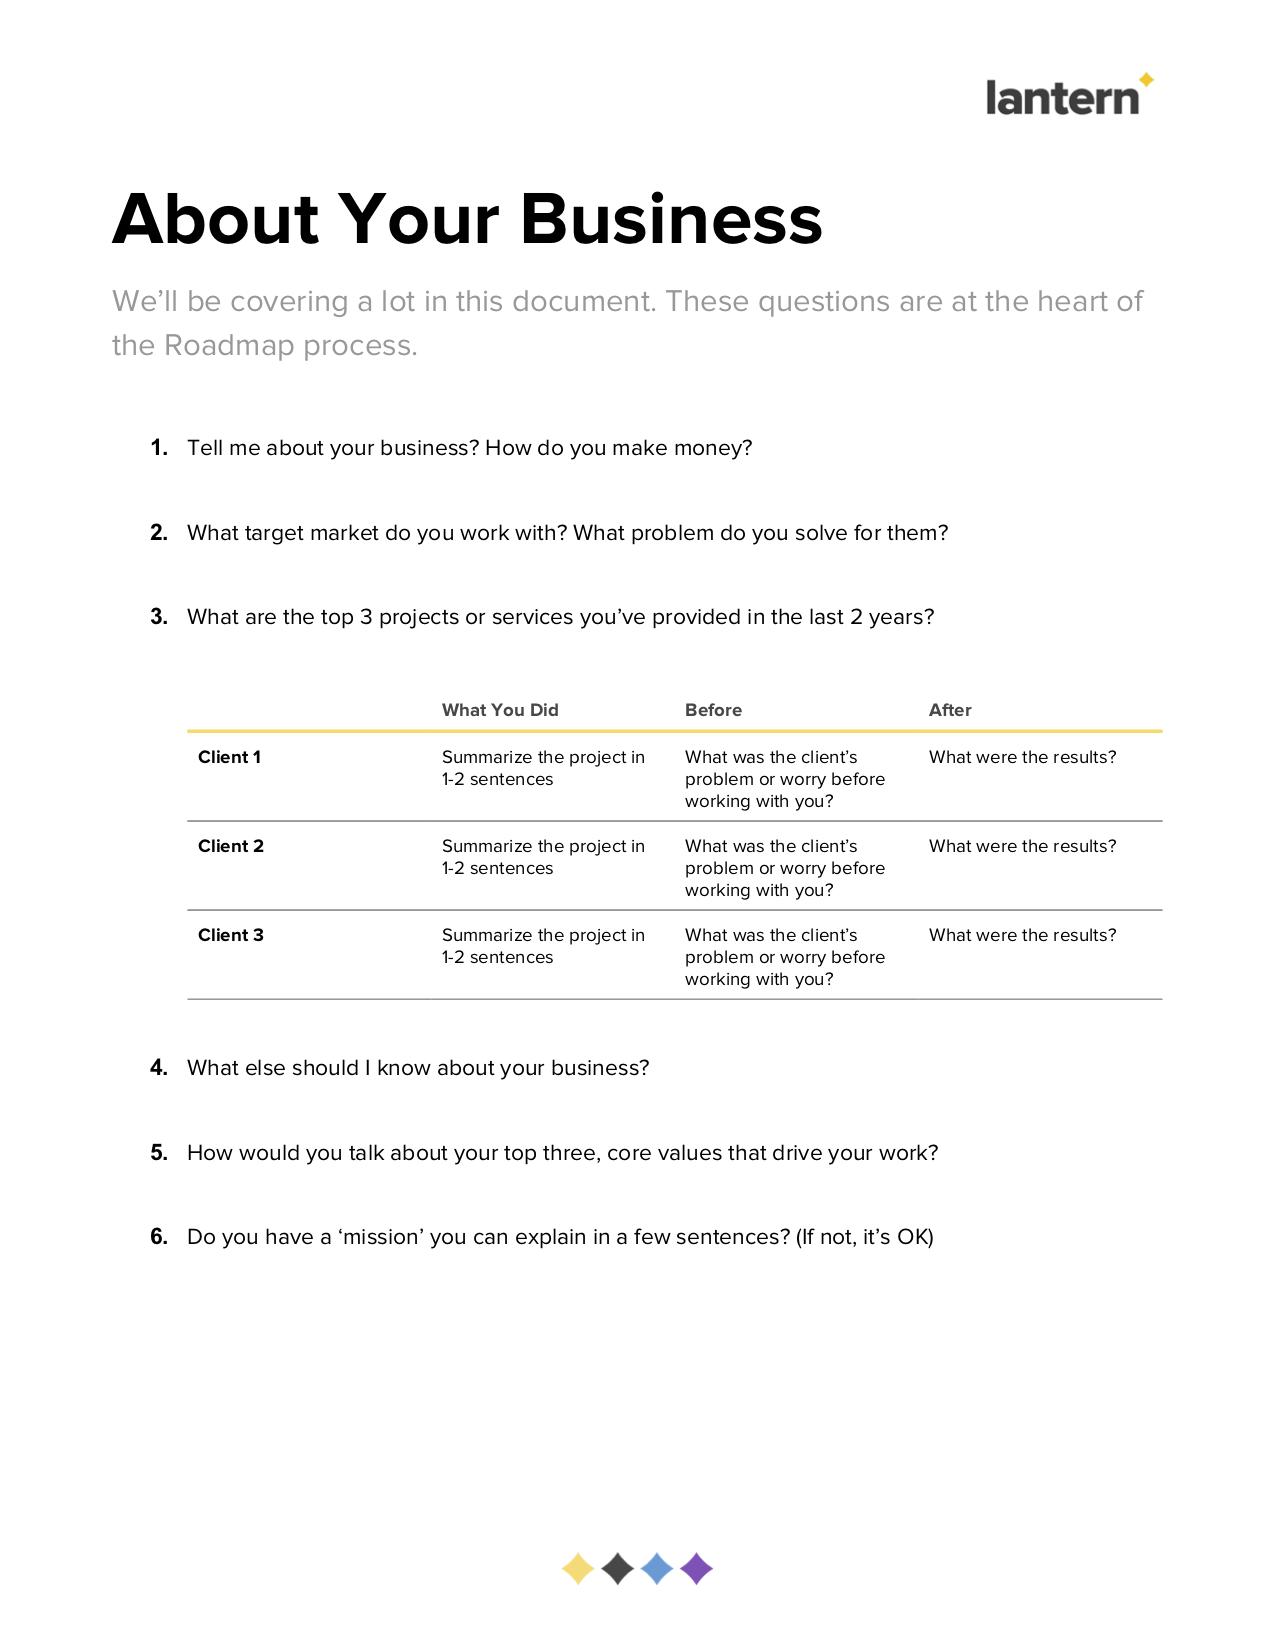 Marketing Roadmap Kickoff Questions_2.png